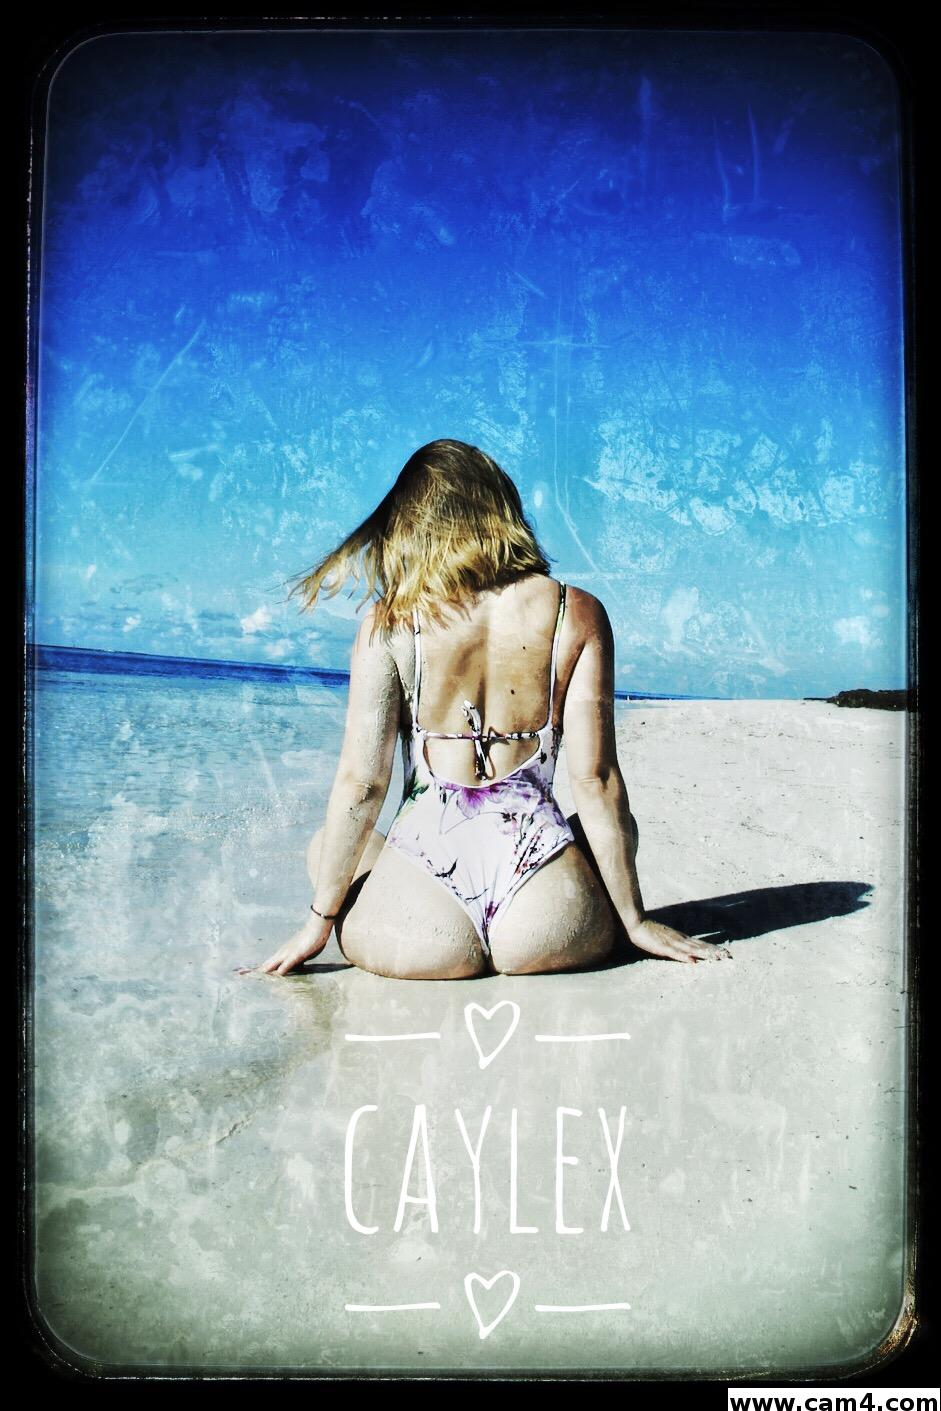 Caylex1?s=mh3gpqebqmb0+j3iavltybgicyesm2fbh8qwehc4io8=